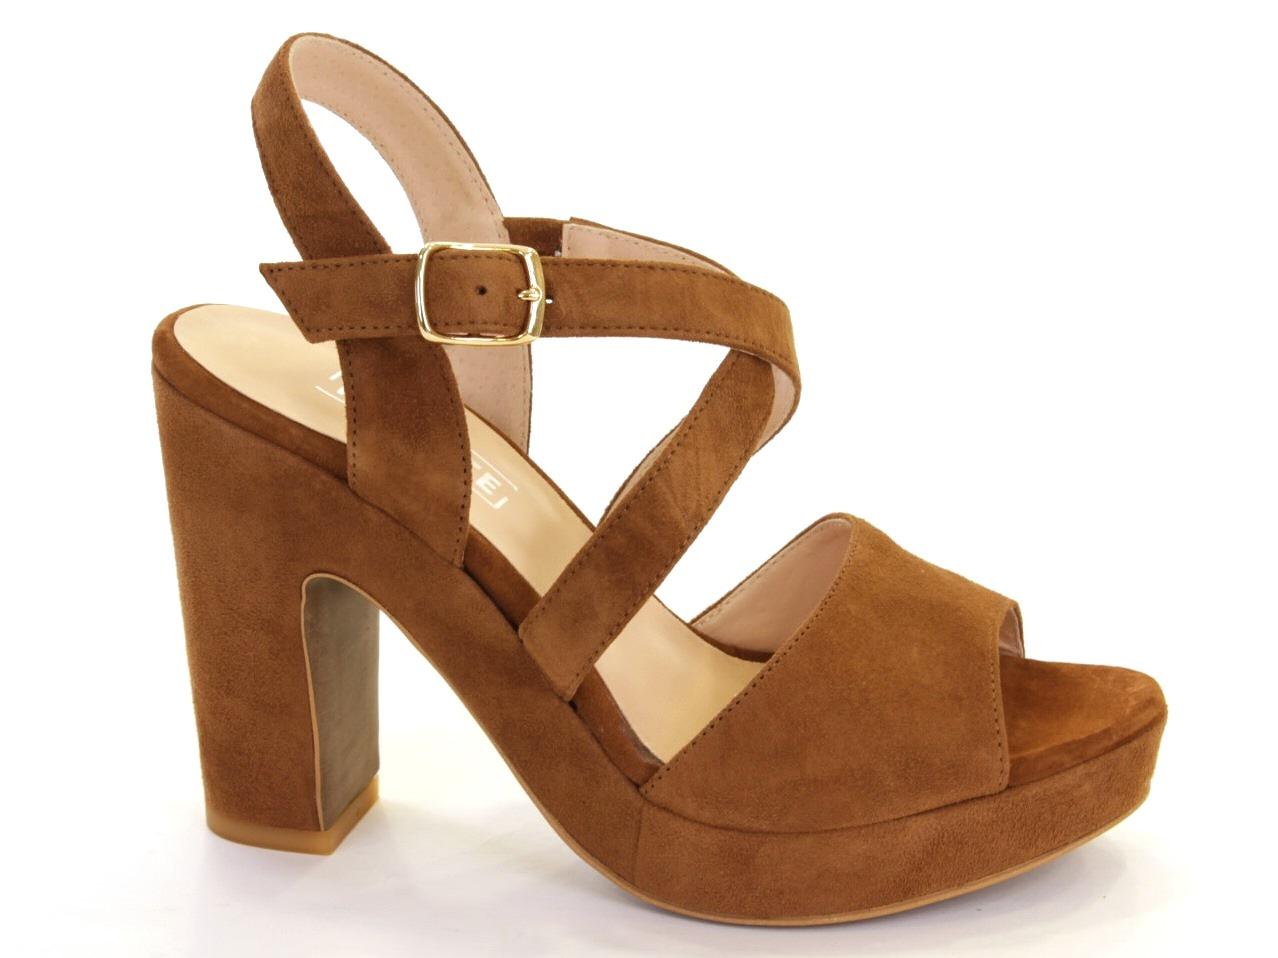 Heel Sandals Sofia Costa - 085 7877